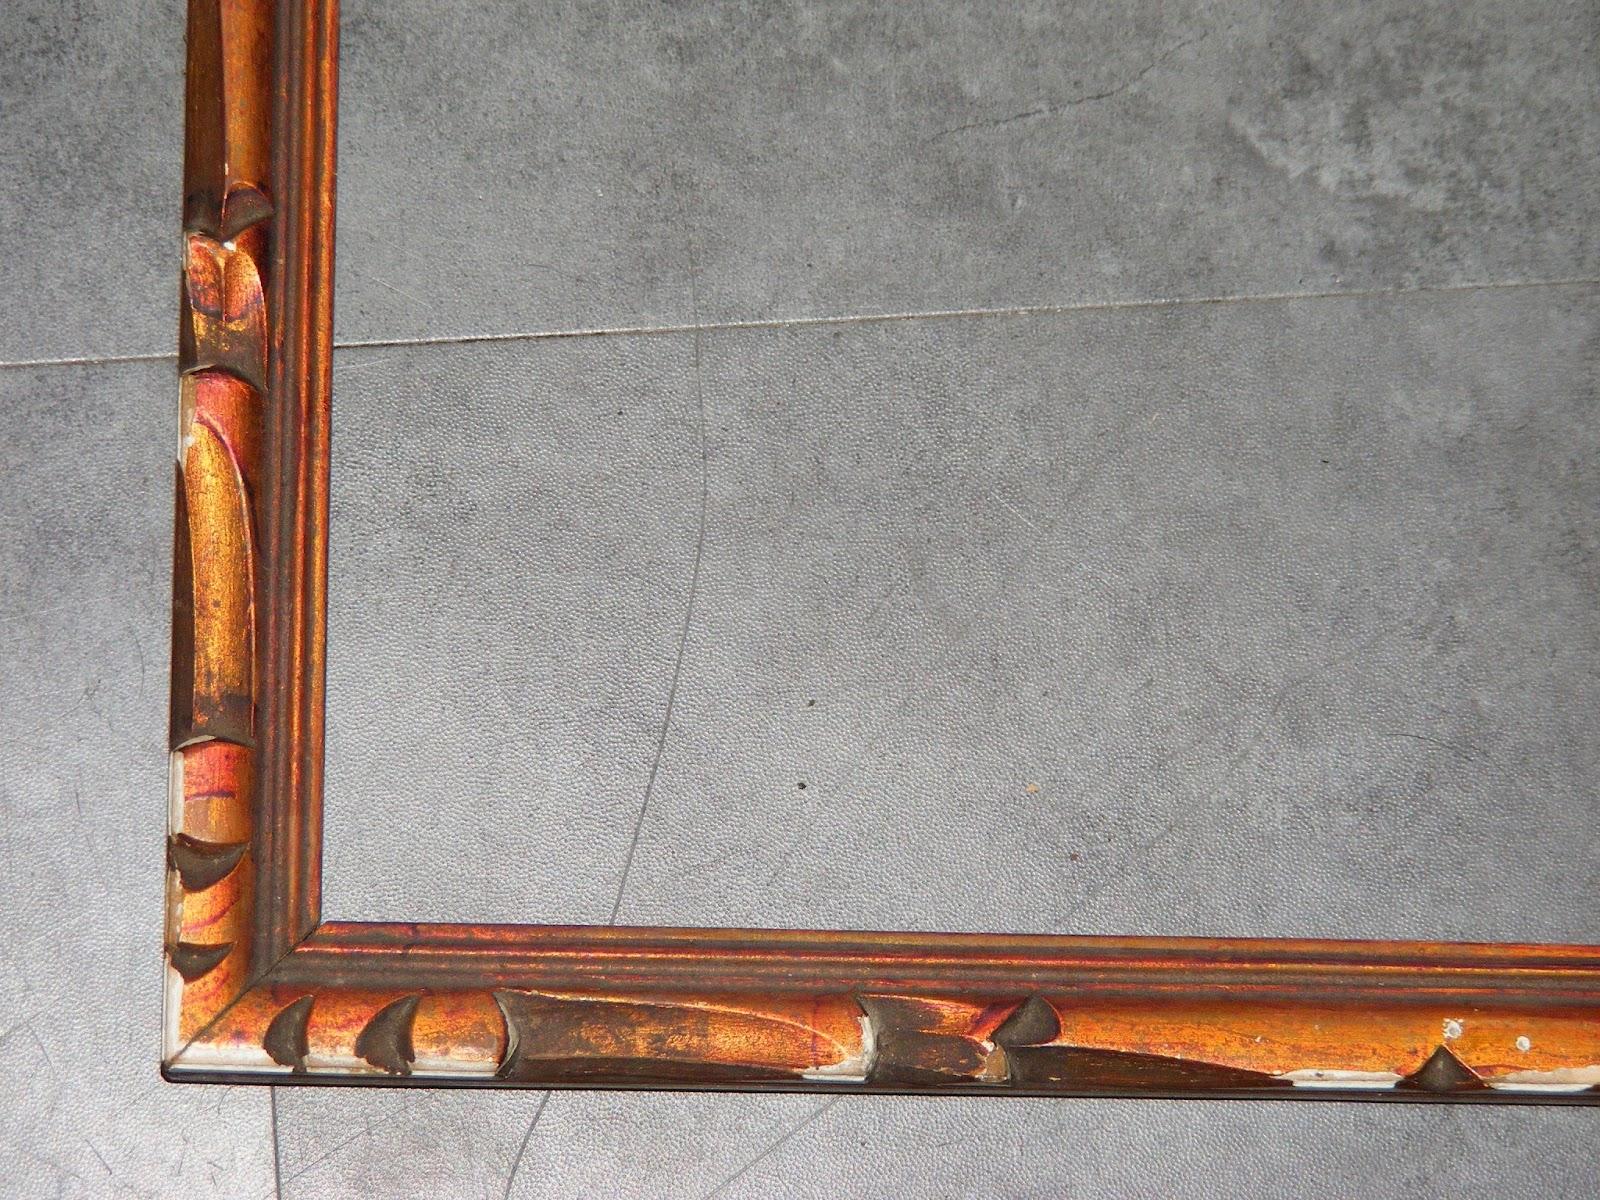 ancien cadre en bois sculpte patine cuivree a restaurer 33cmx43cm cadr160 ebay. Black Bedroom Furniture Sets. Home Design Ideas